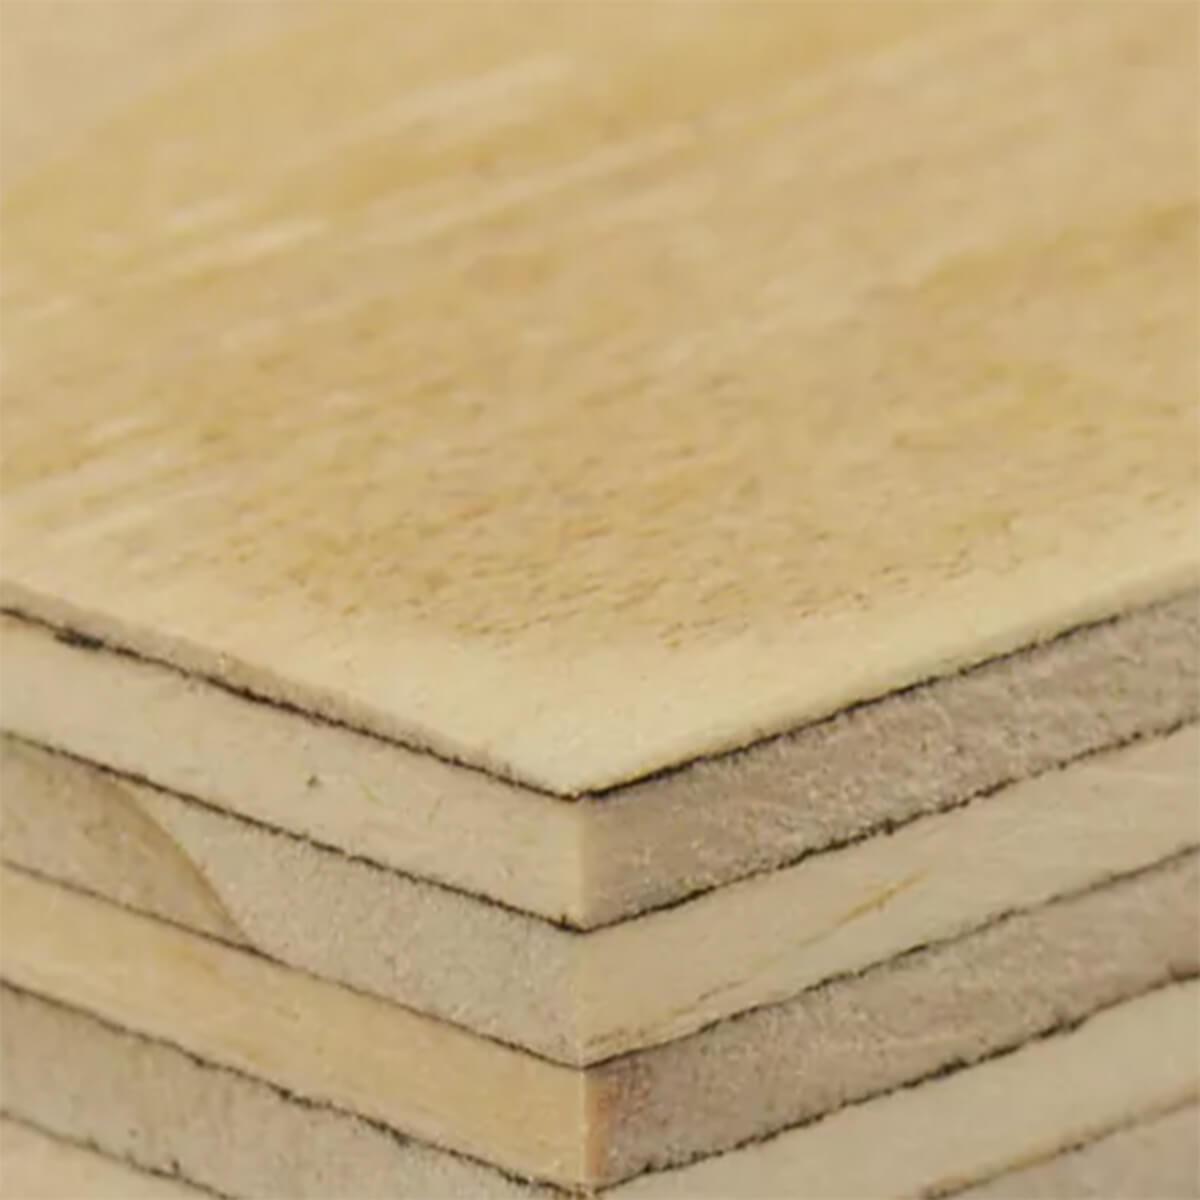 Sanded Fir G1S Plywood - 4 X 8 - 8 MM